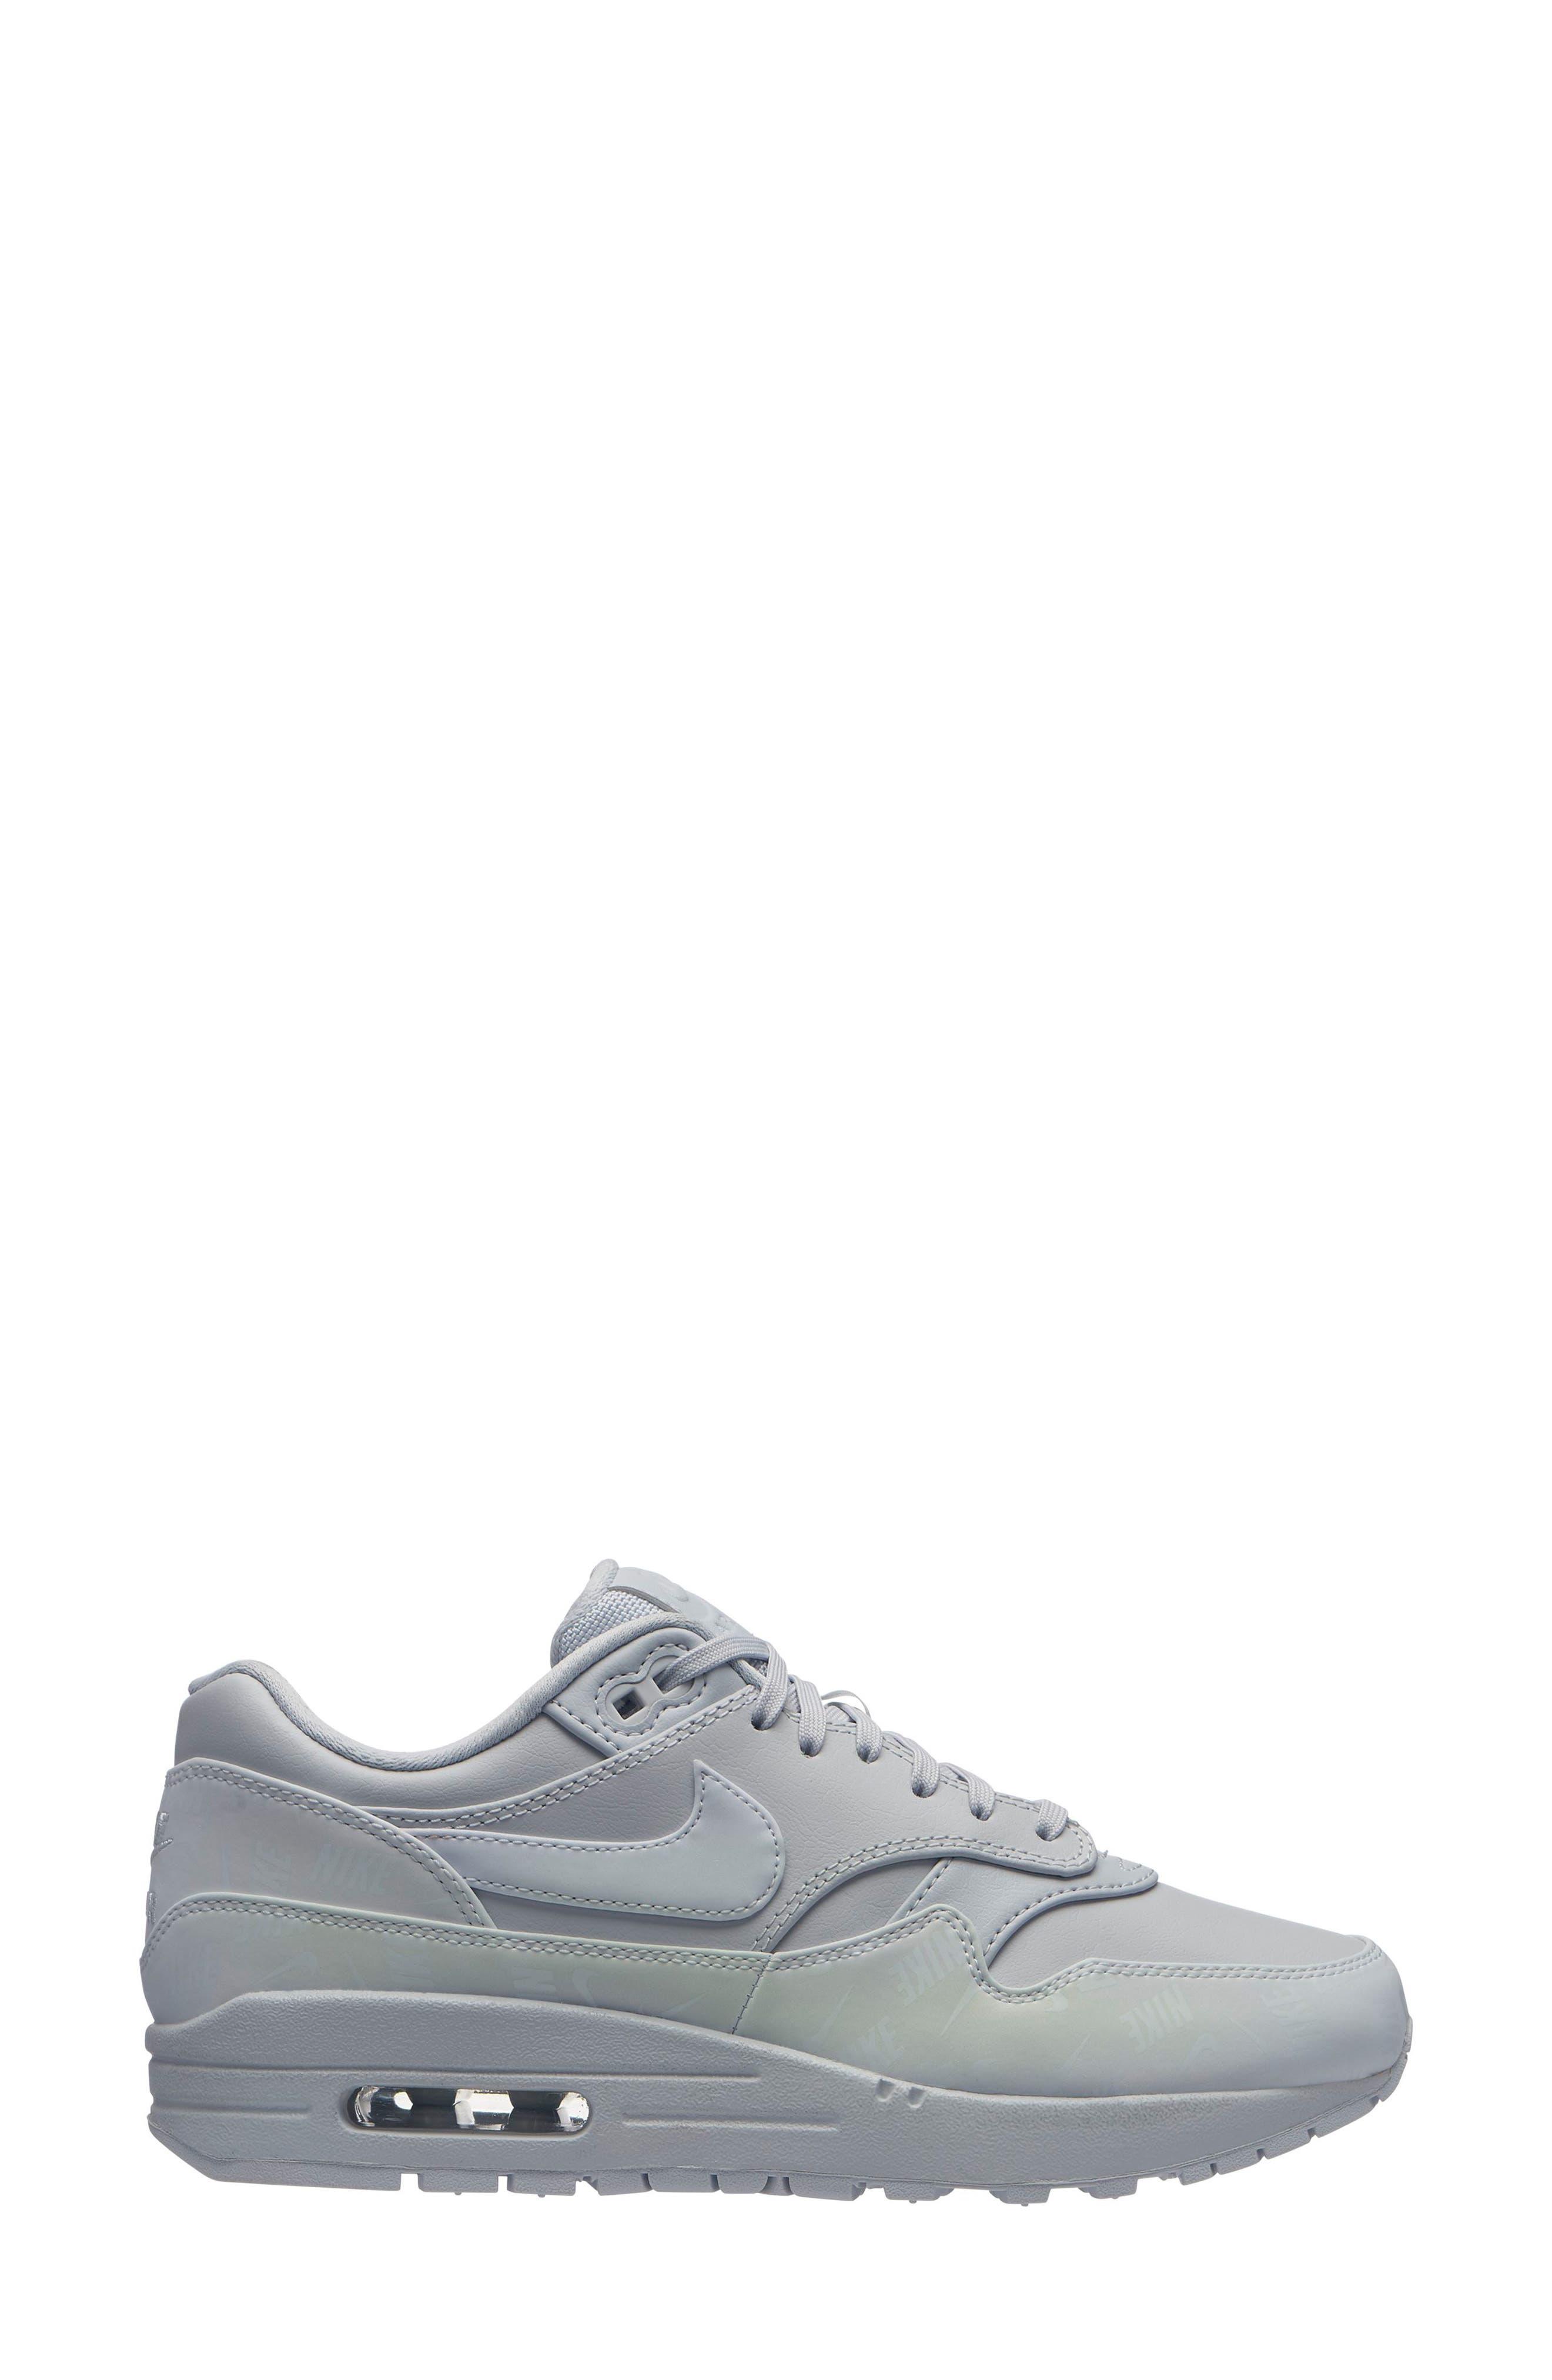 Air Max 1 Lux Sneaker,                             Main thumbnail 1, color,                             PURE PLATINUM/ PURE PLATINUM